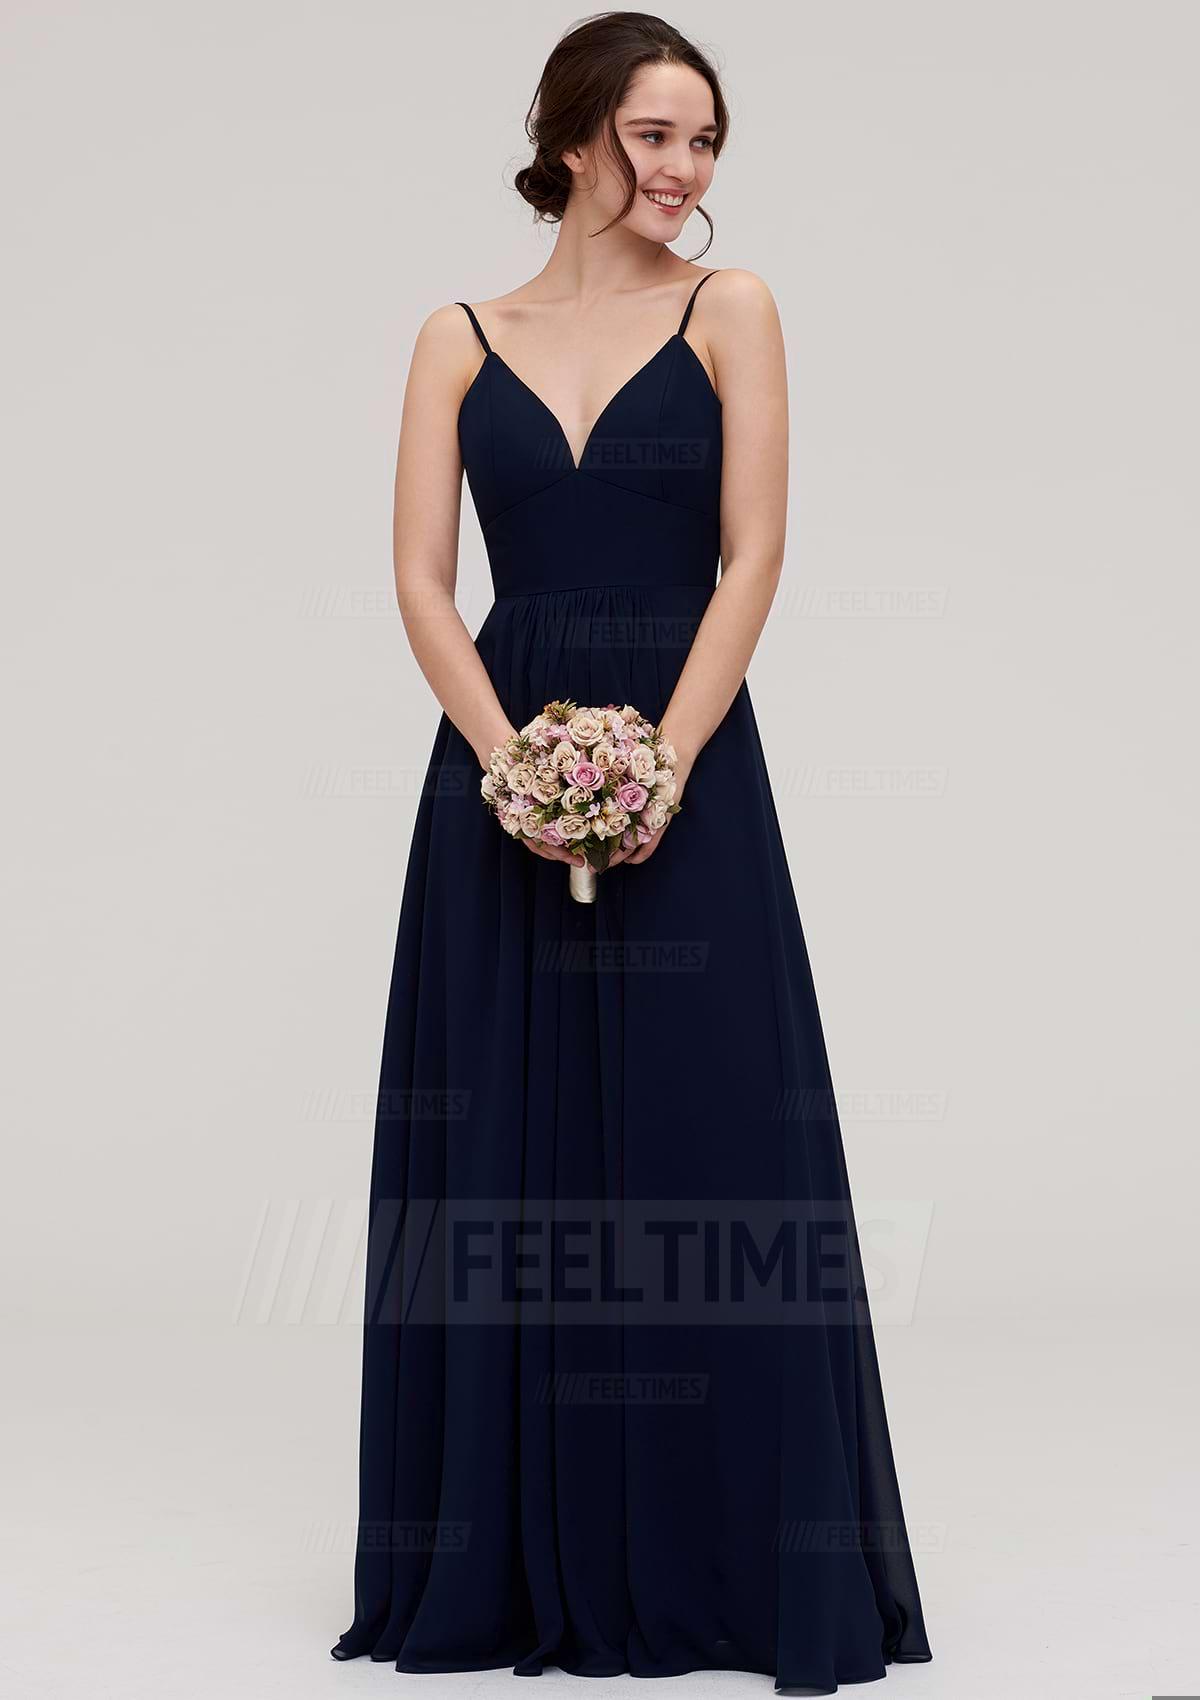 A-Line/Princess V Neck Sleeveless Long/Floor-Length Chiffon Bridesmaid Dress With Pleated